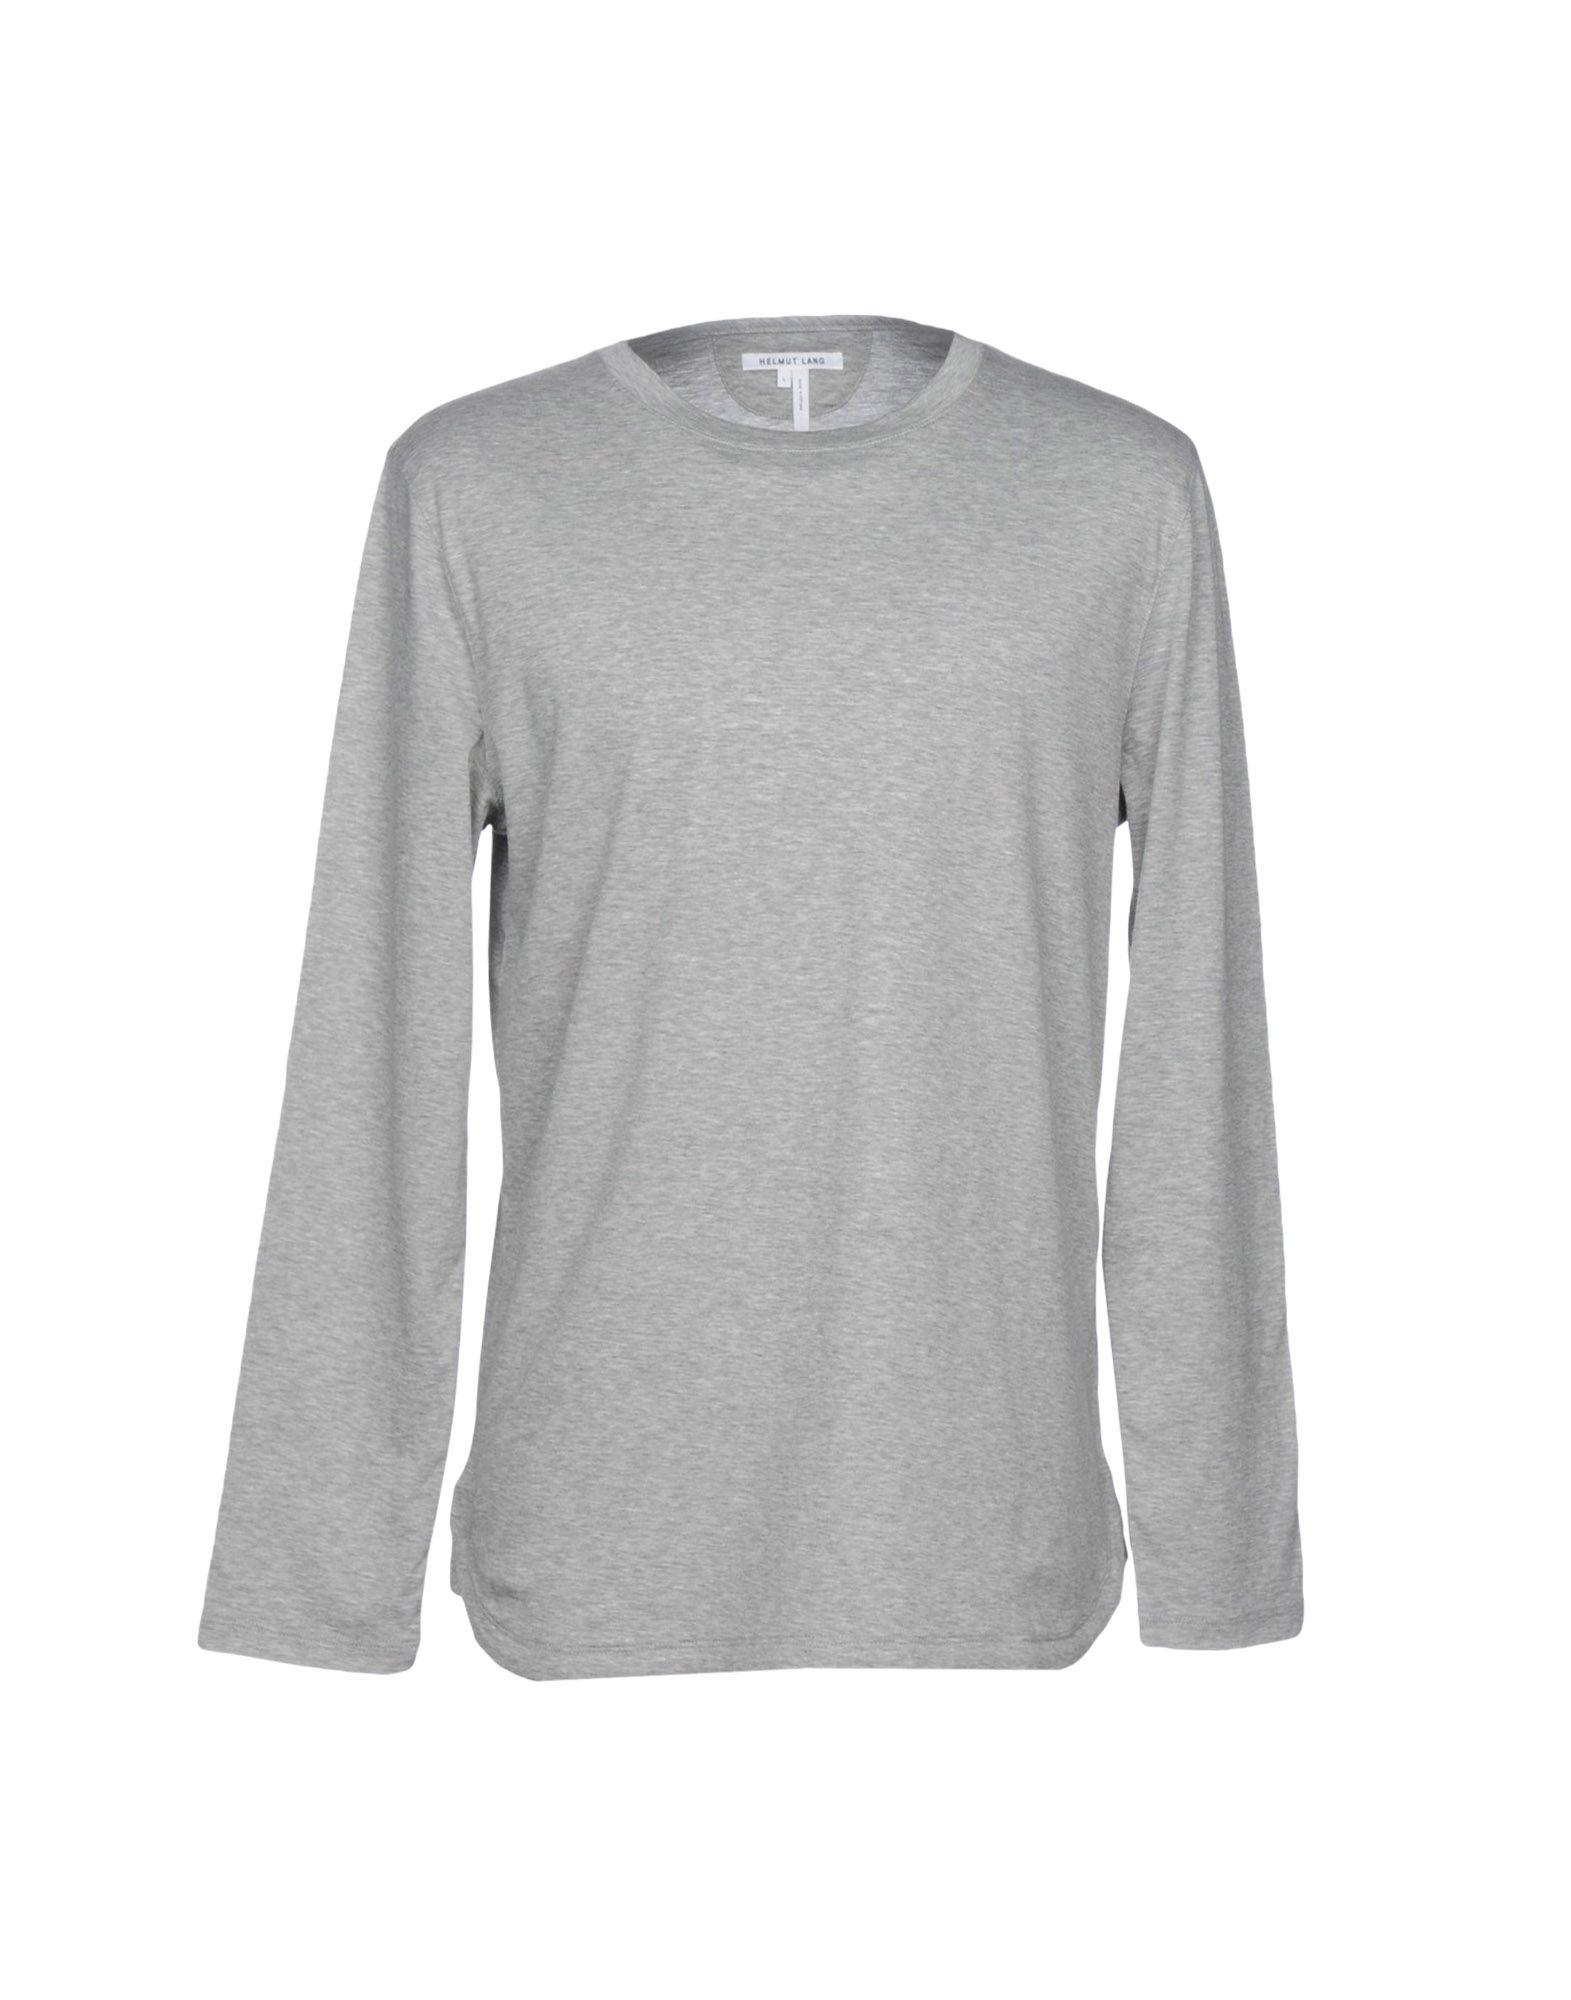 Helmut Lang T-shirt In Light Grey